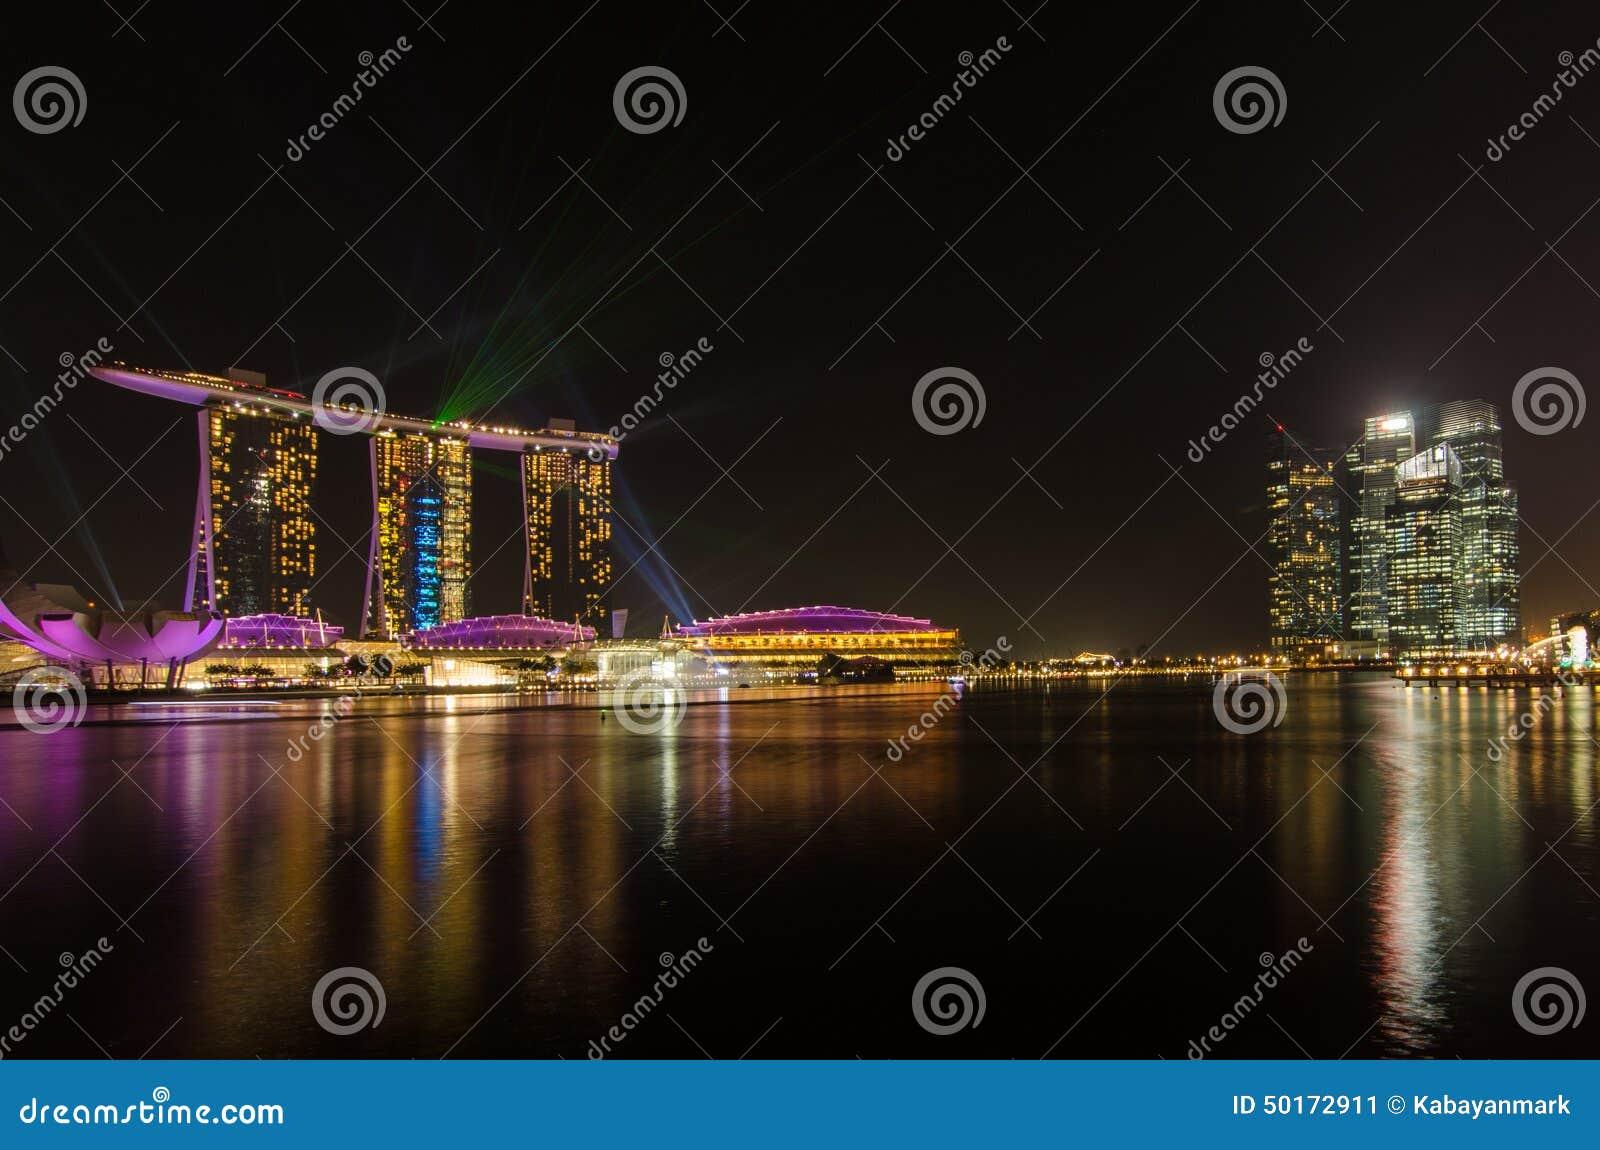 Marina Bay Singapore With Laser Lights Green And Blue Night Black Sky Beauti